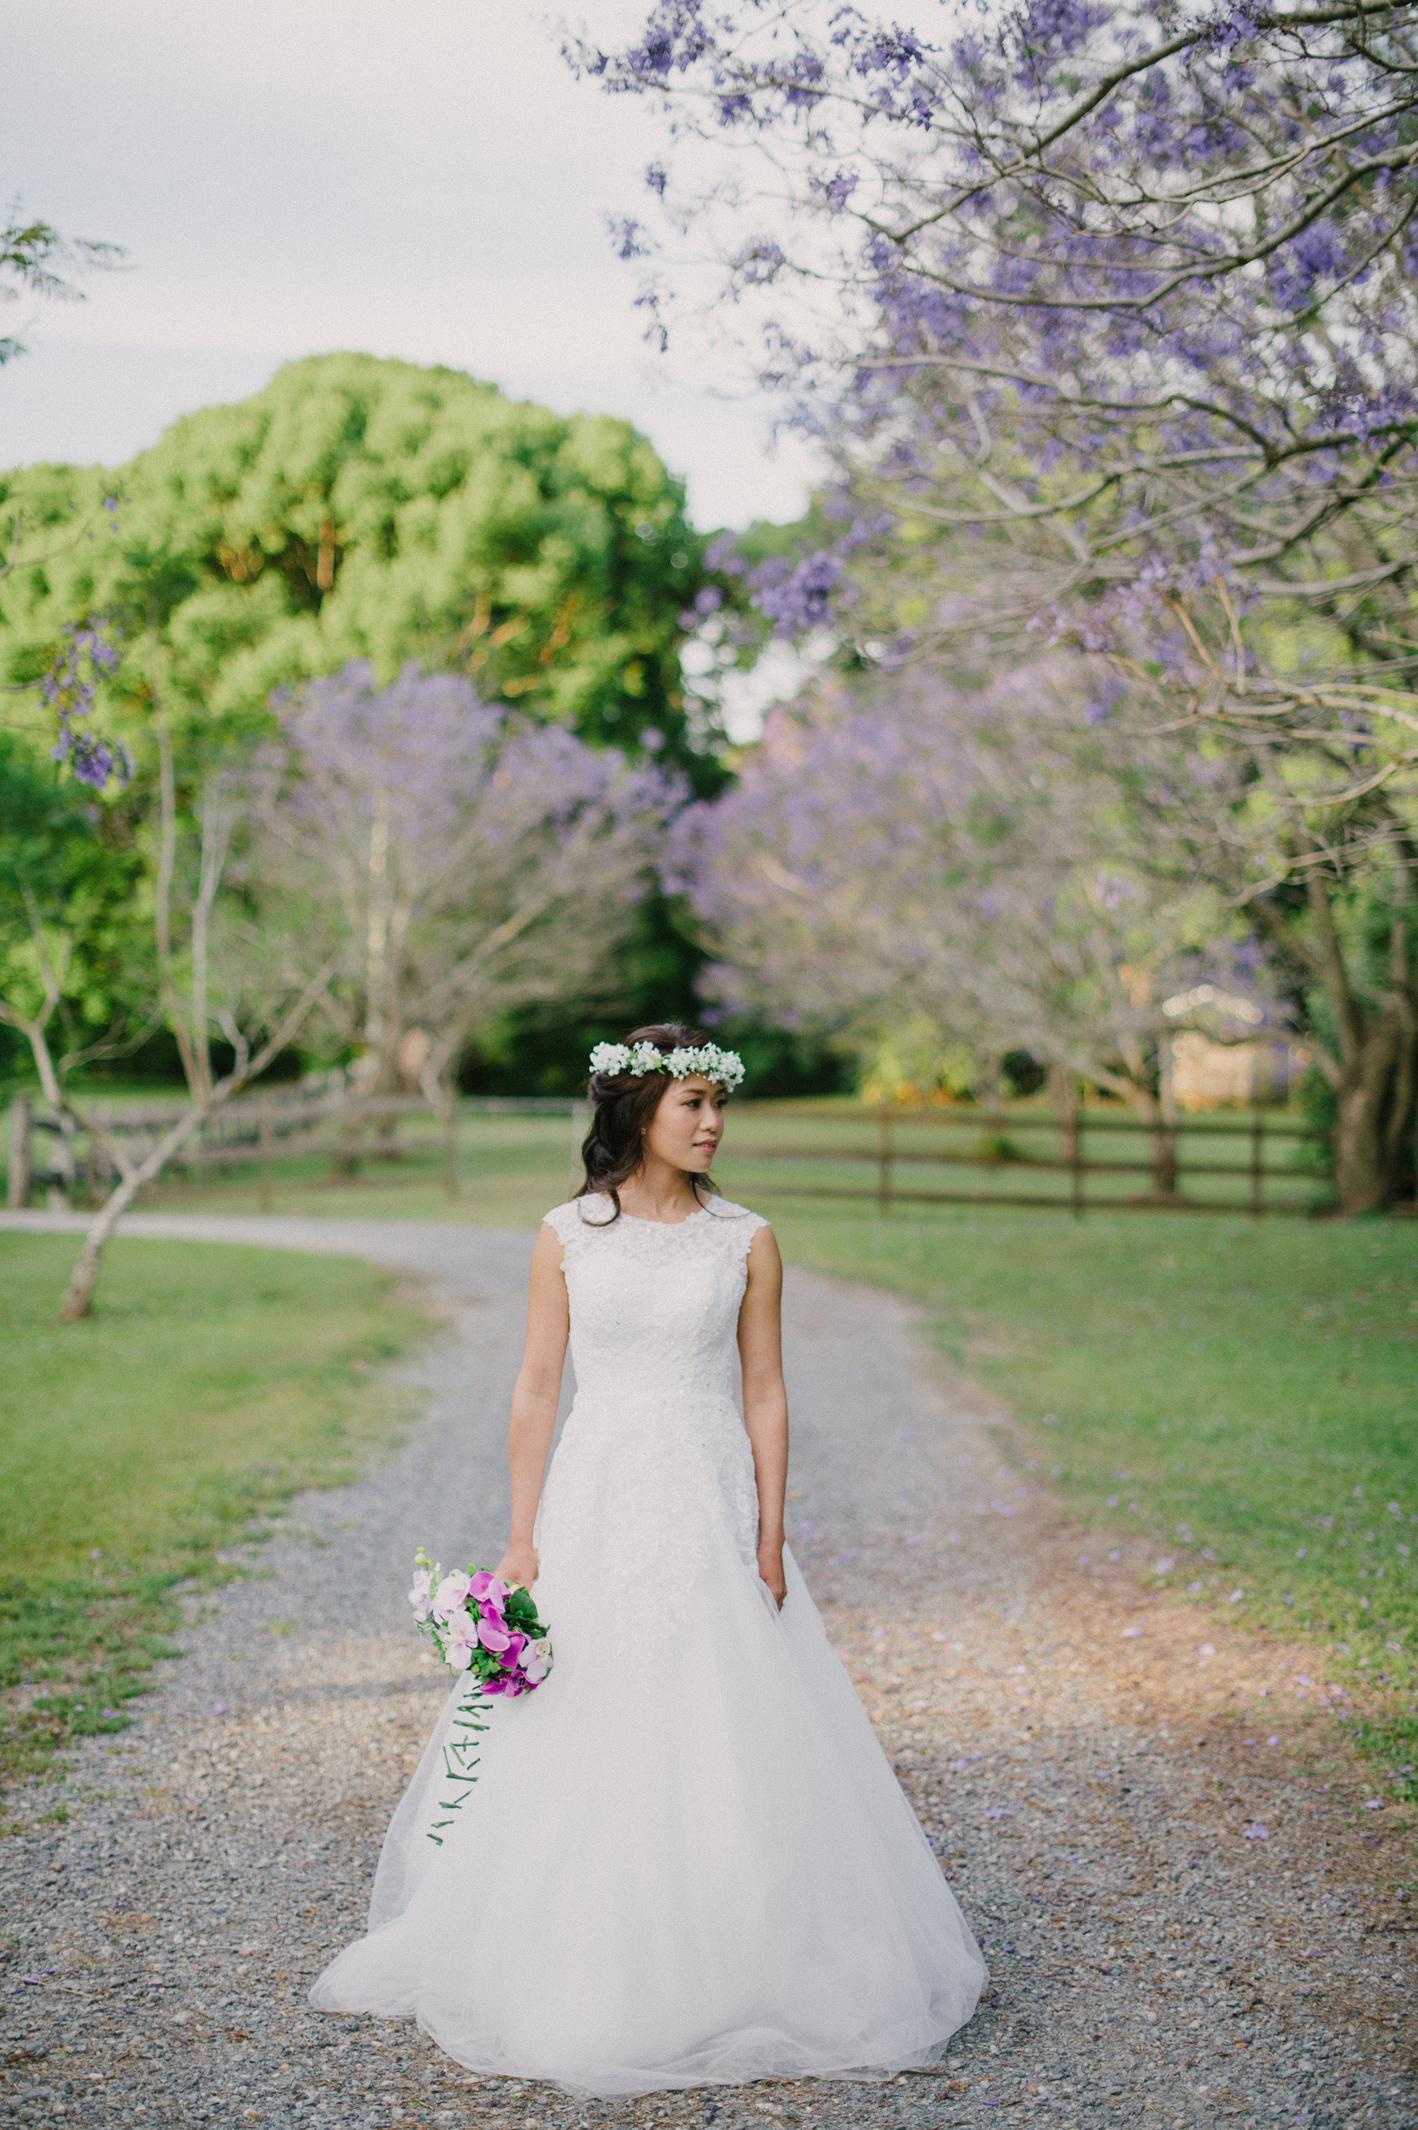 011-ed-janet-currumbin-wedding_sophie-baker-photography